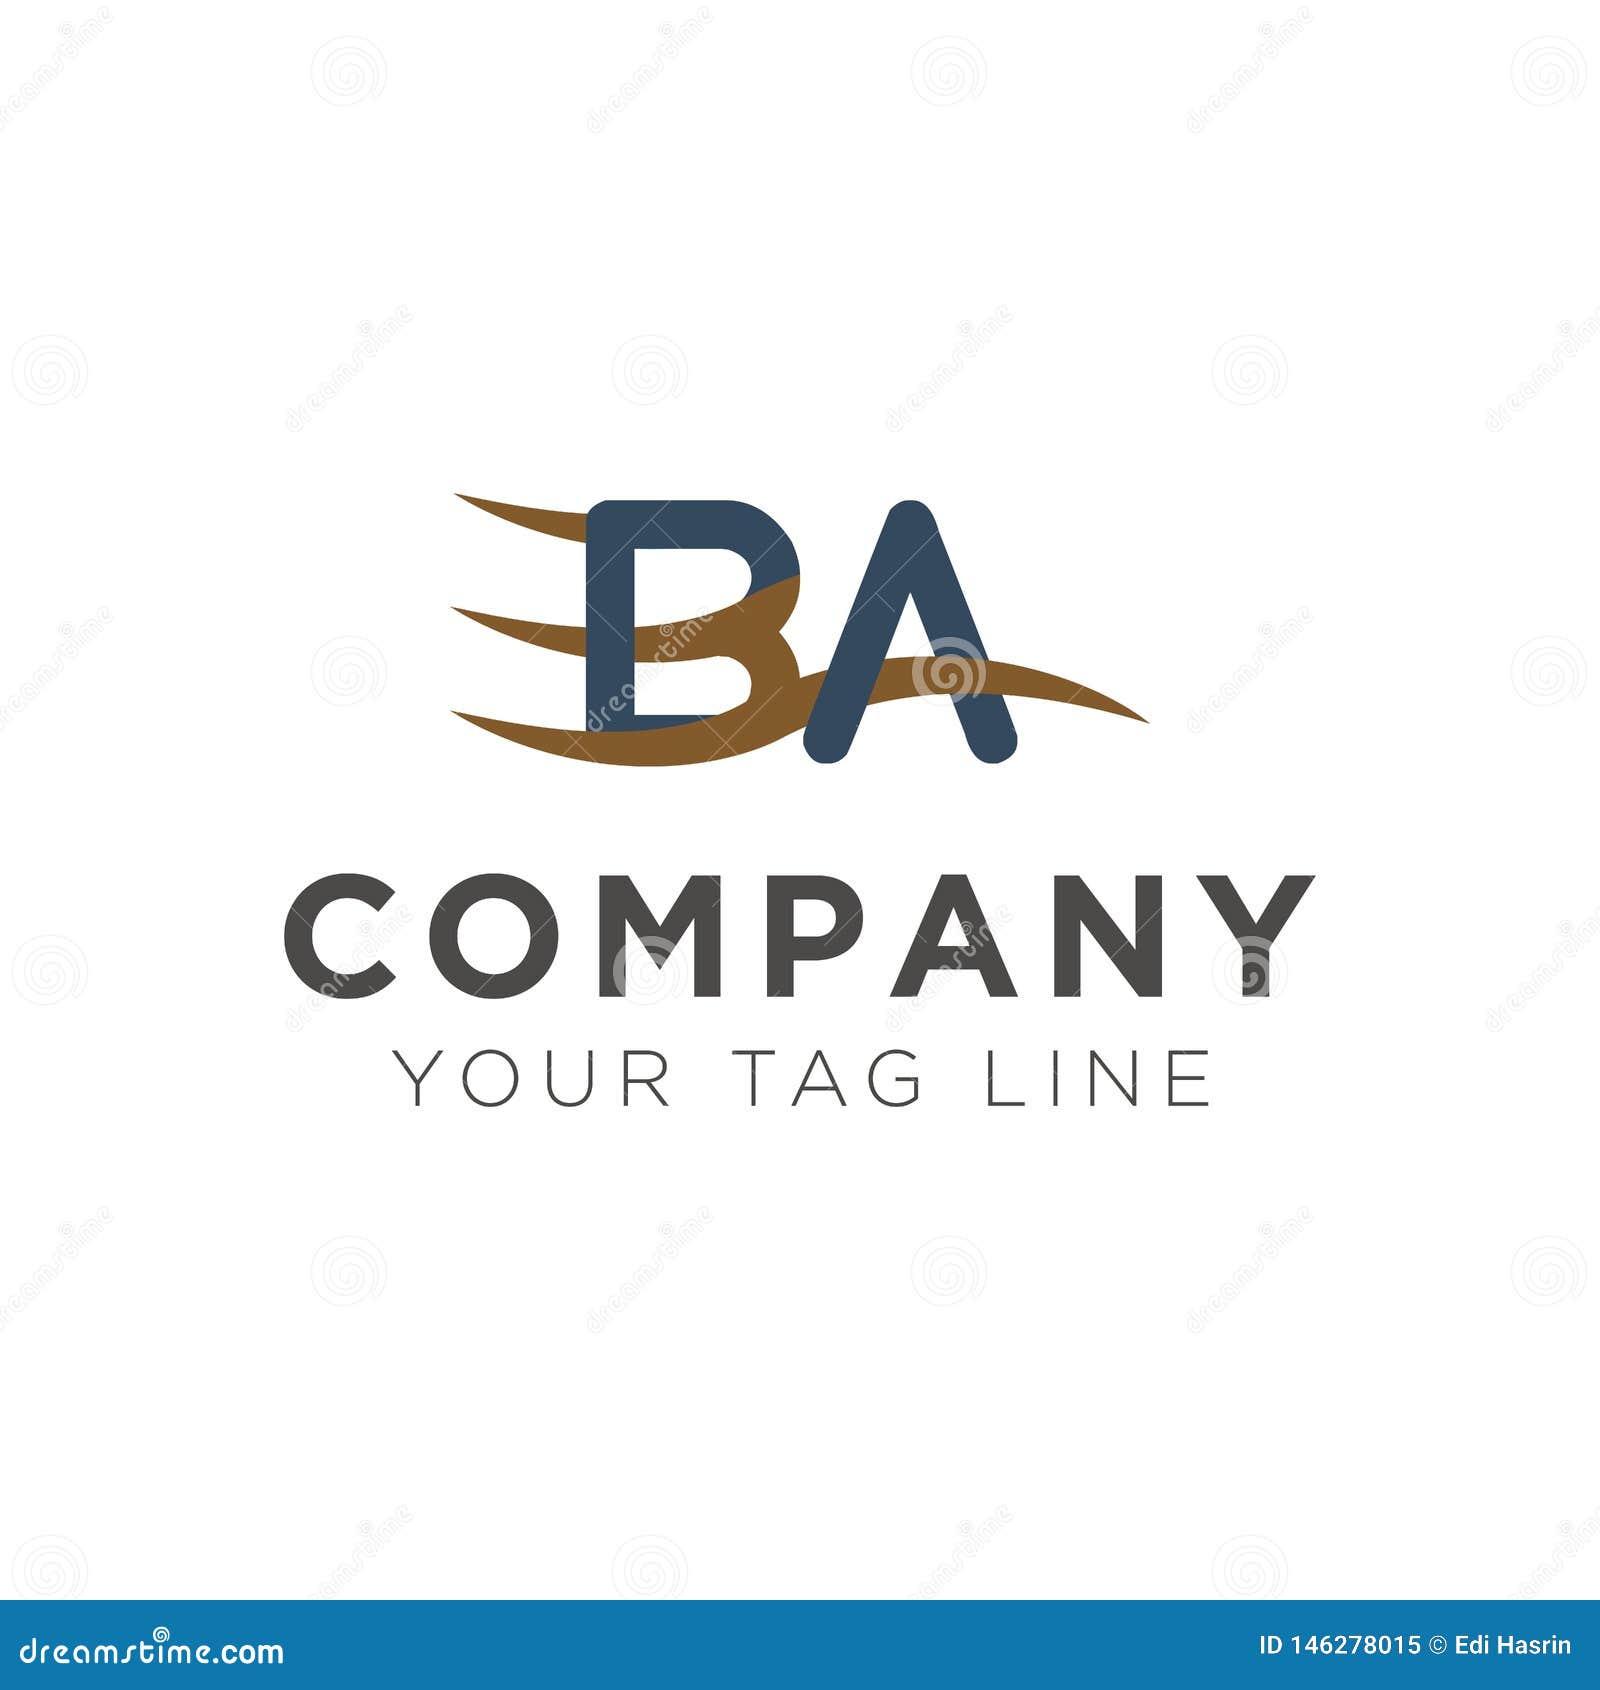 Шаблон логотипа письма БА с элементами волны